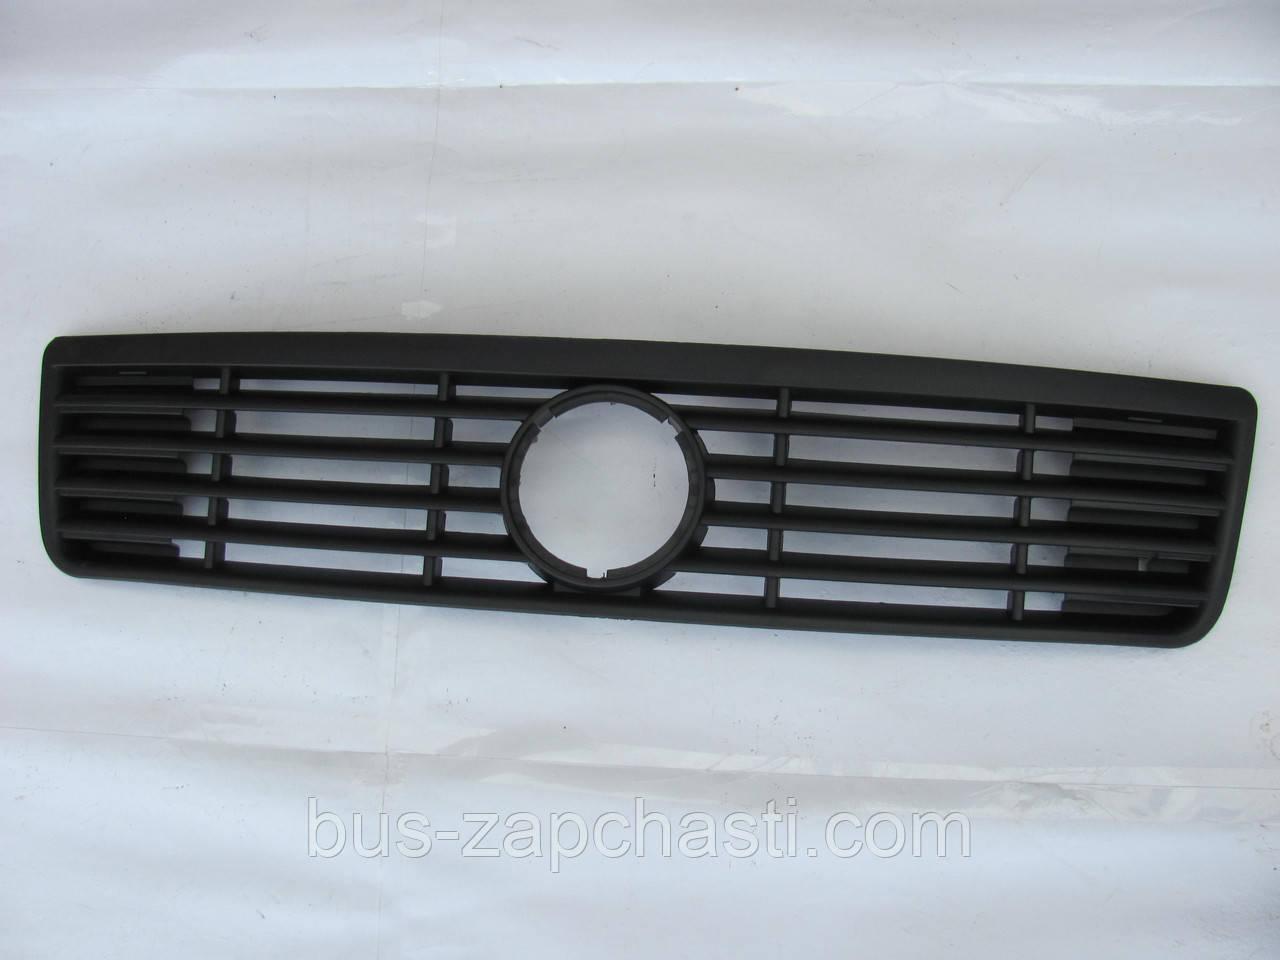 Решётка радиатора VW LT 28-46 1996-2006 — Rotweiss (Турция) — 2D0853653